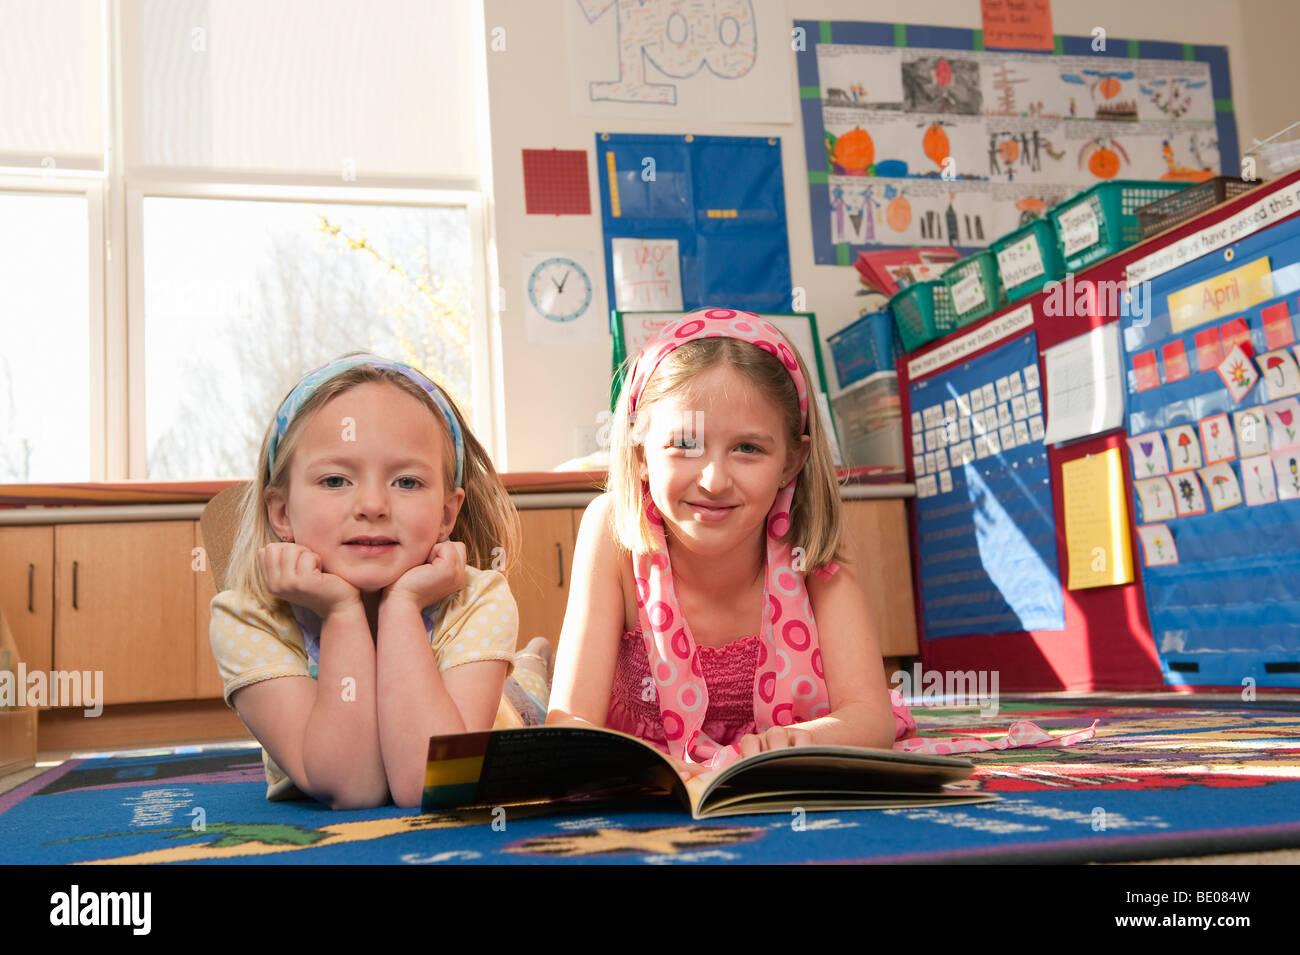 Elementary School Children Reading - Stock Image